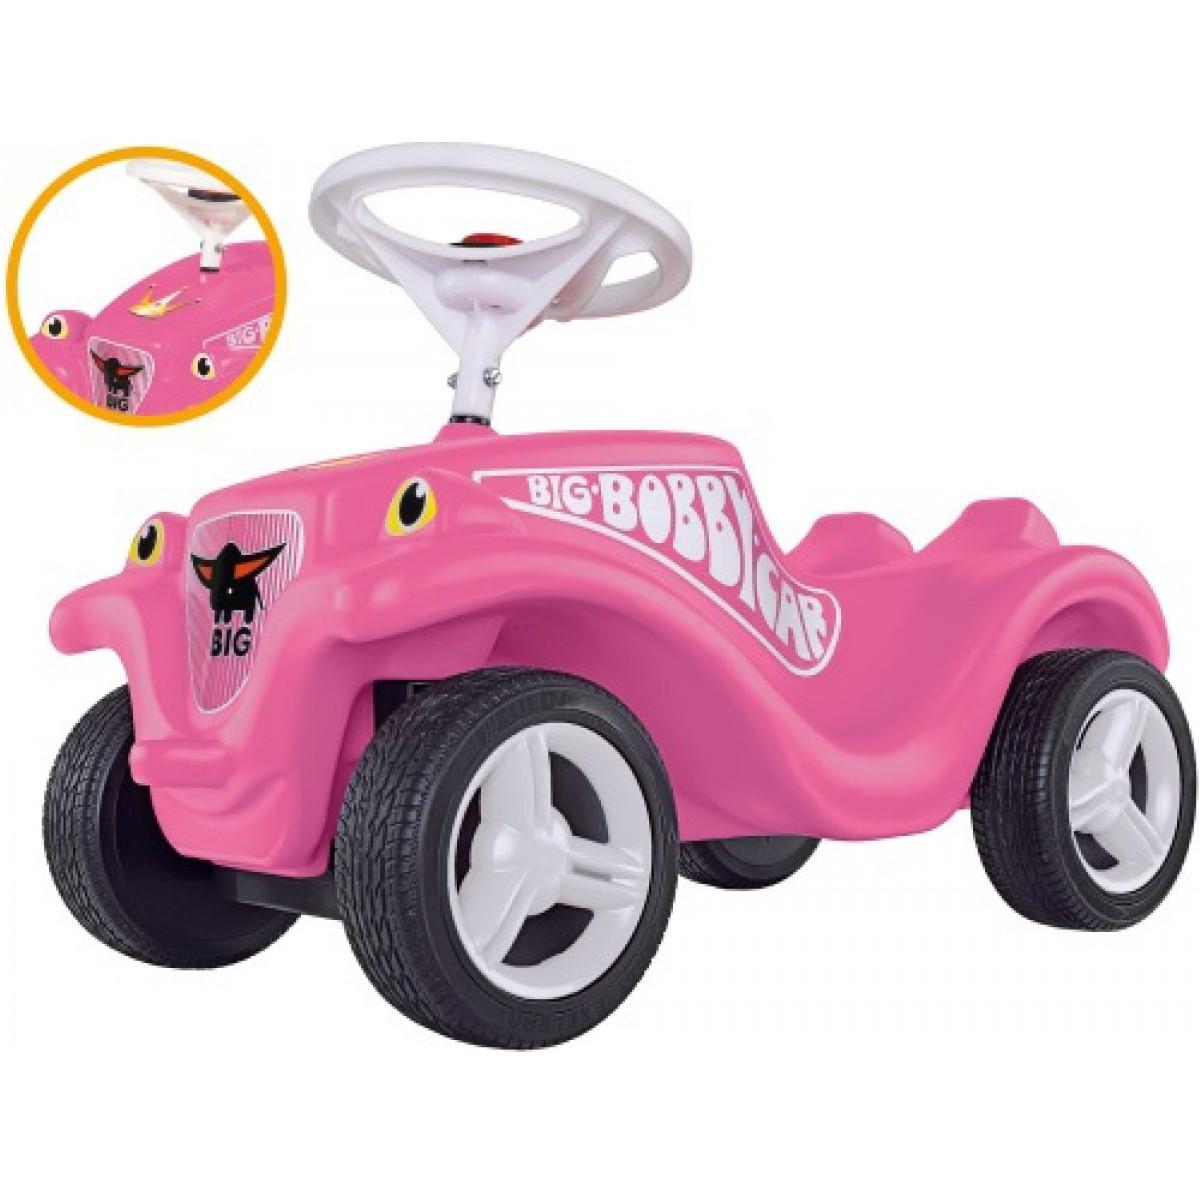 simba big bobby car princess pink weiss fl sterr der exklusiv timmi spielwaren onlineshop. Black Bedroom Furniture Sets. Home Design Ideas